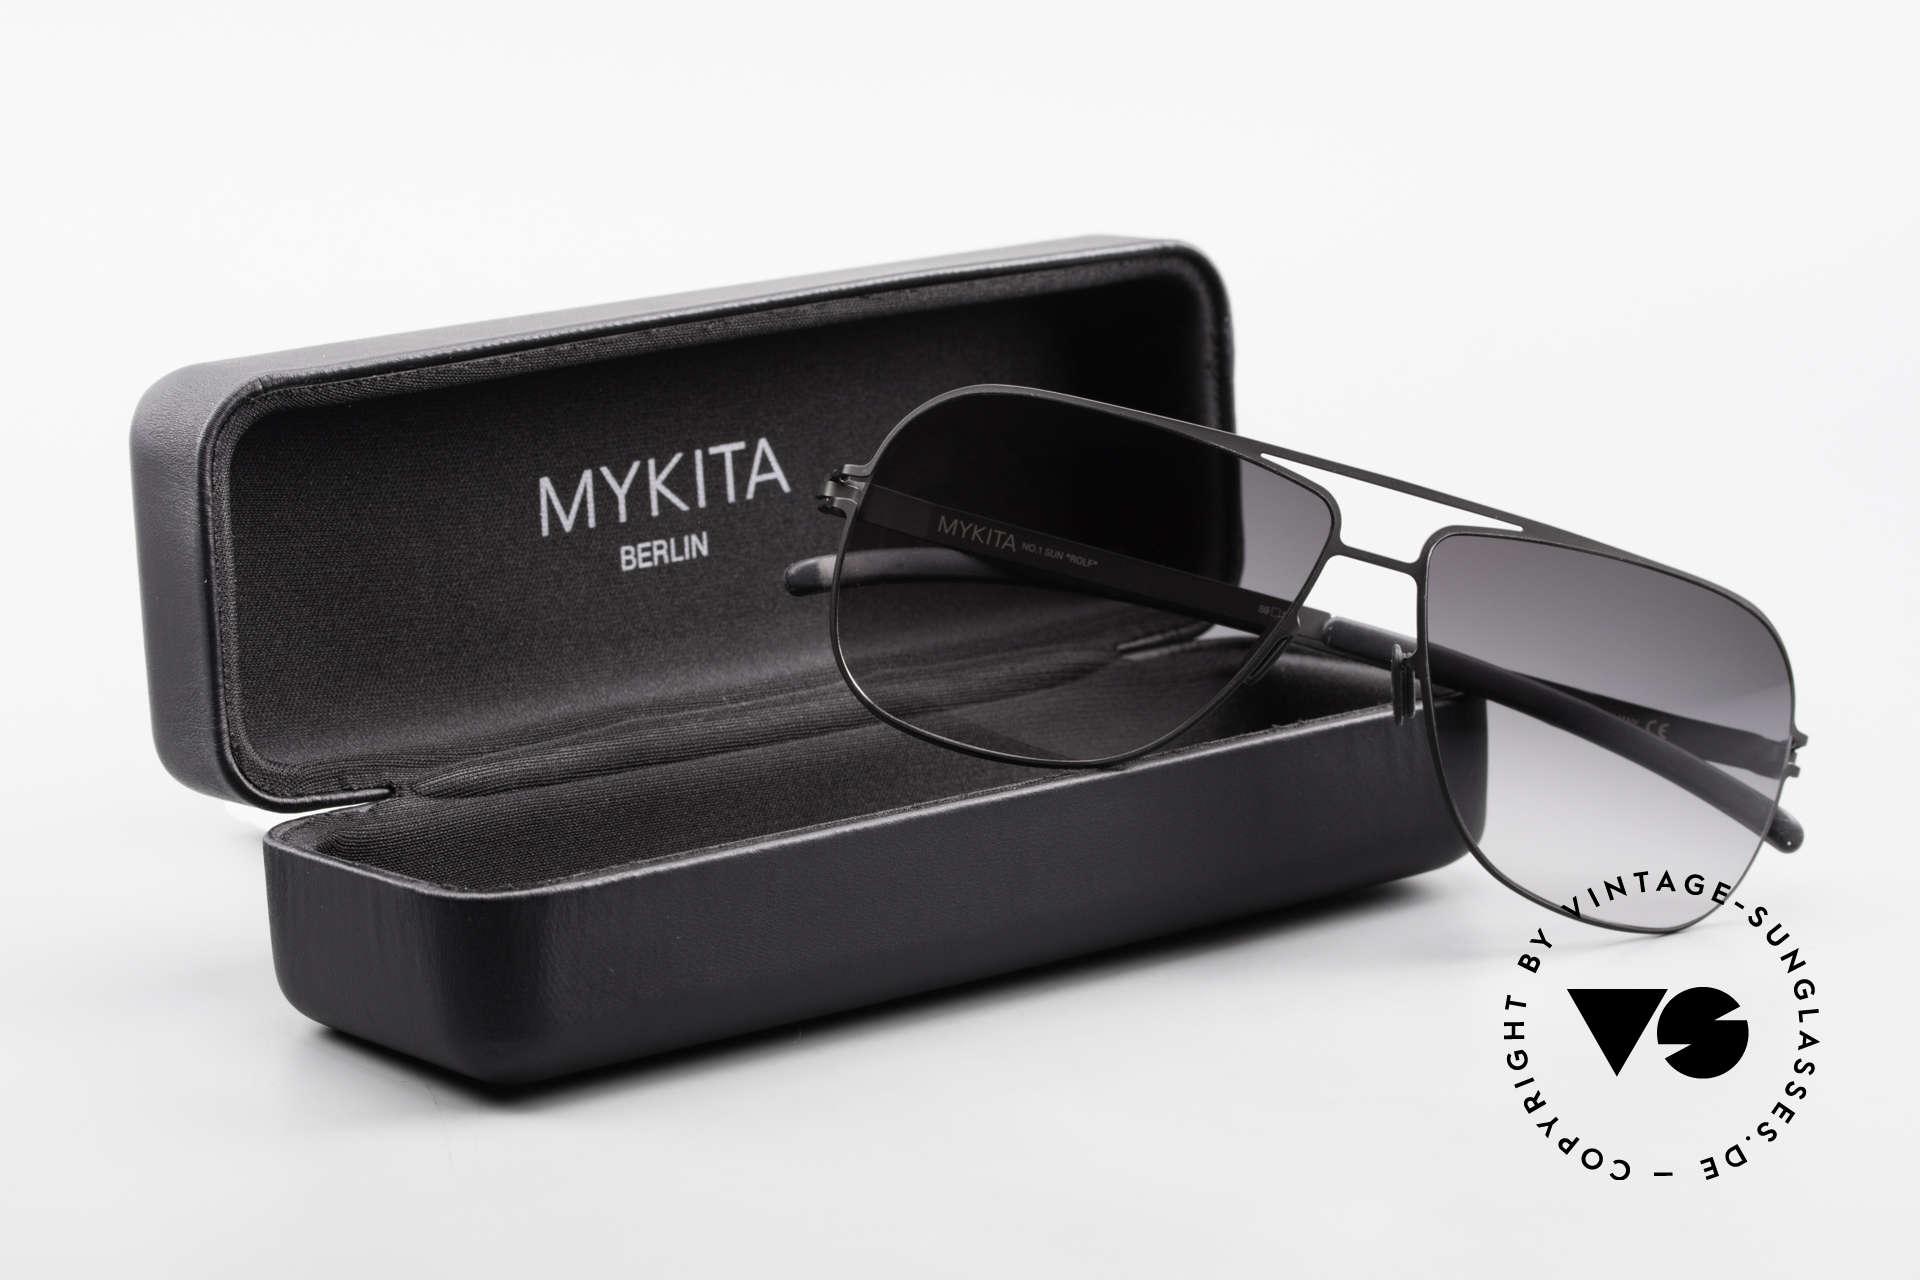 Mykita Rolf Brad Pitt Mykita Sunglasses, Size: medium, Made for Men and Women